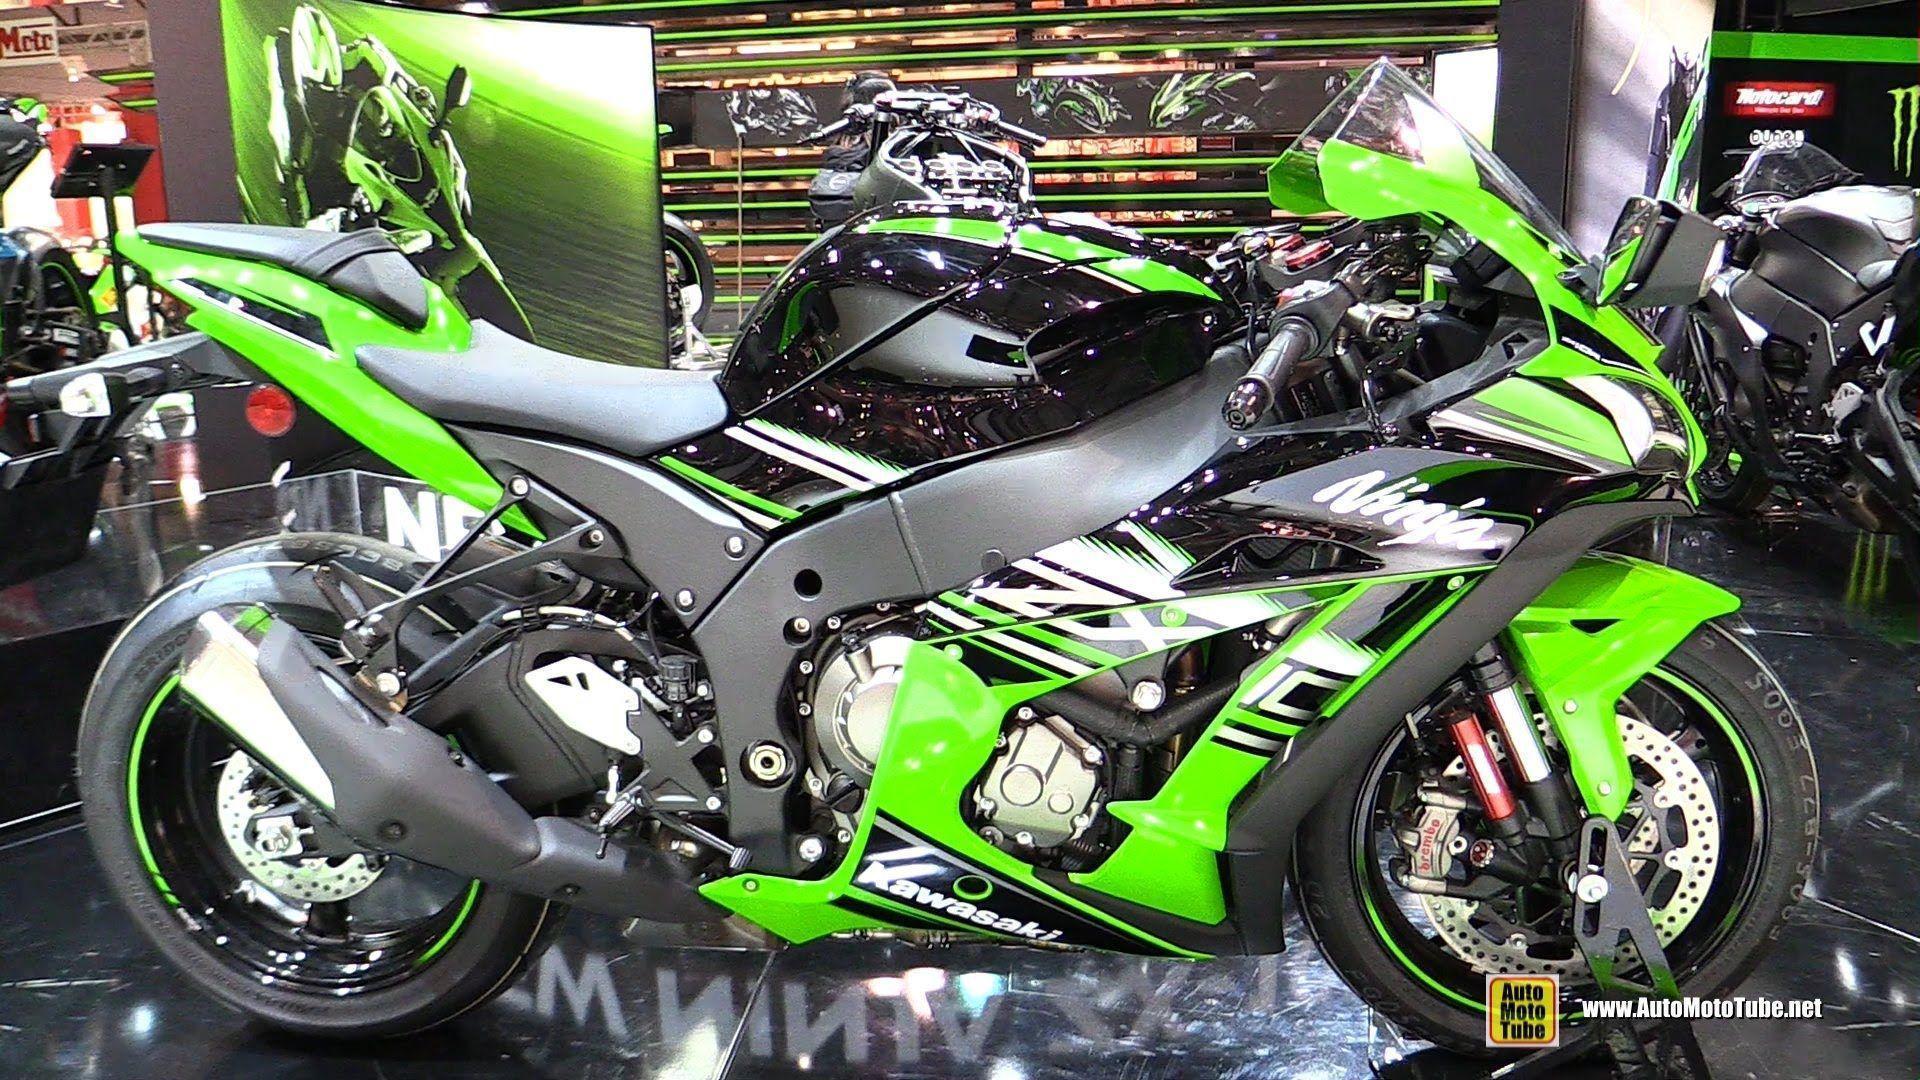 Kawasaki Zx10r 2017 Image 124